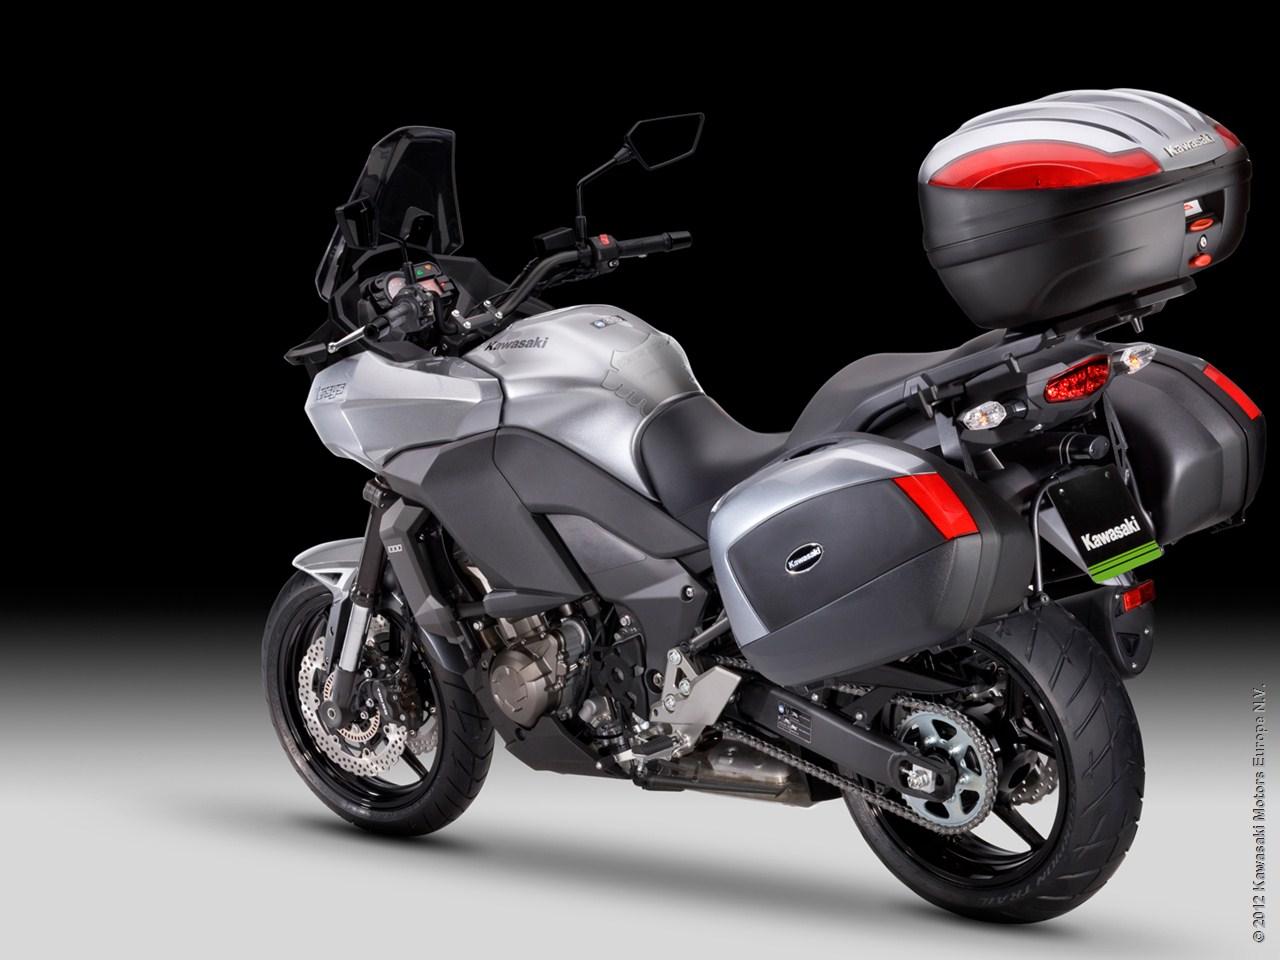 2013 Kawasaki Versys 1000 Grand Tourer Shows Nifty